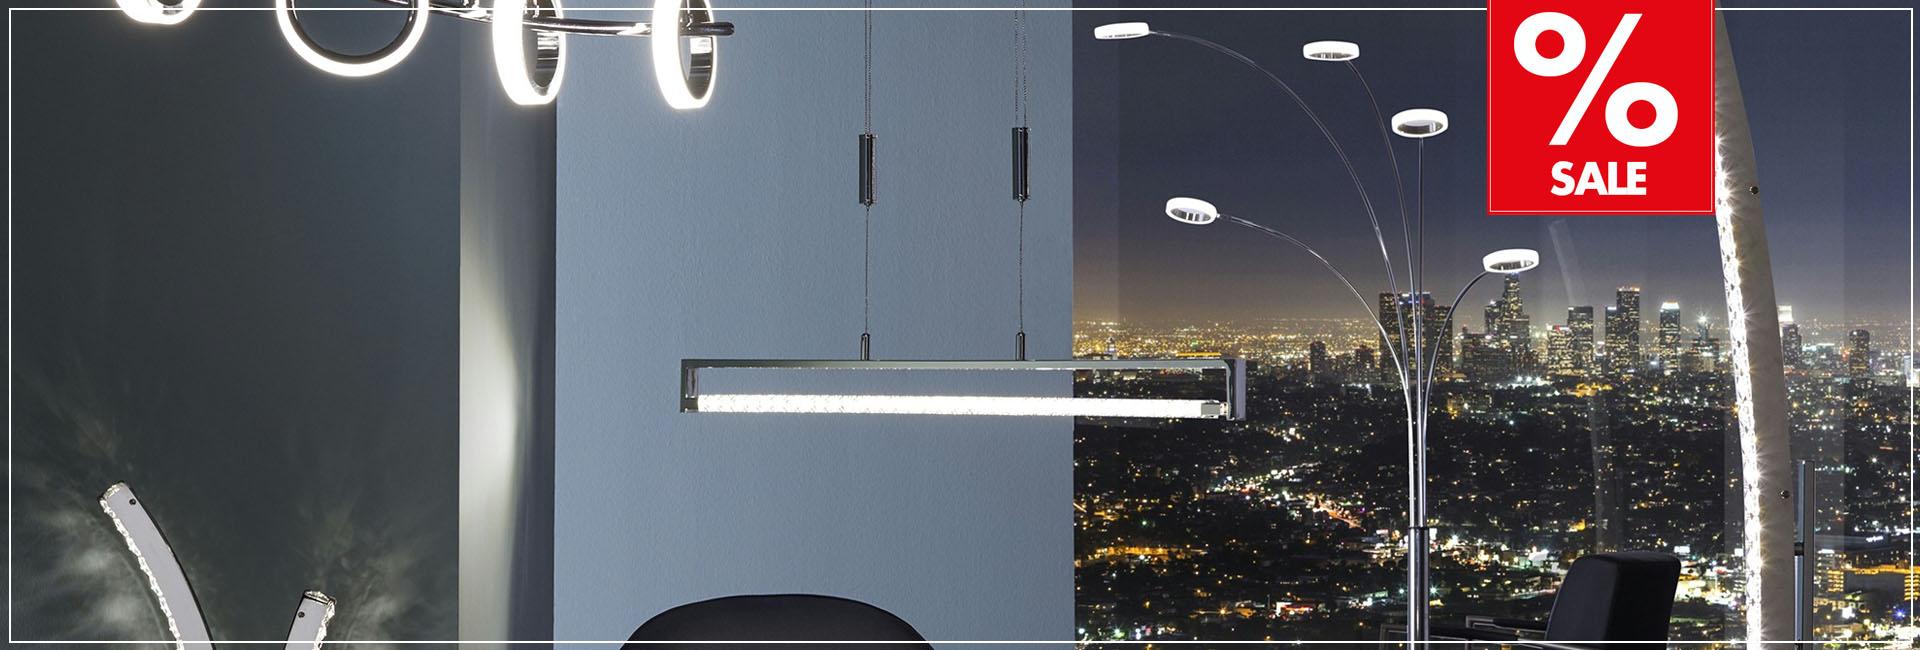 lampen im sale jetzt angebote online kaufen. Black Bedroom Furniture Sets. Home Design Ideas